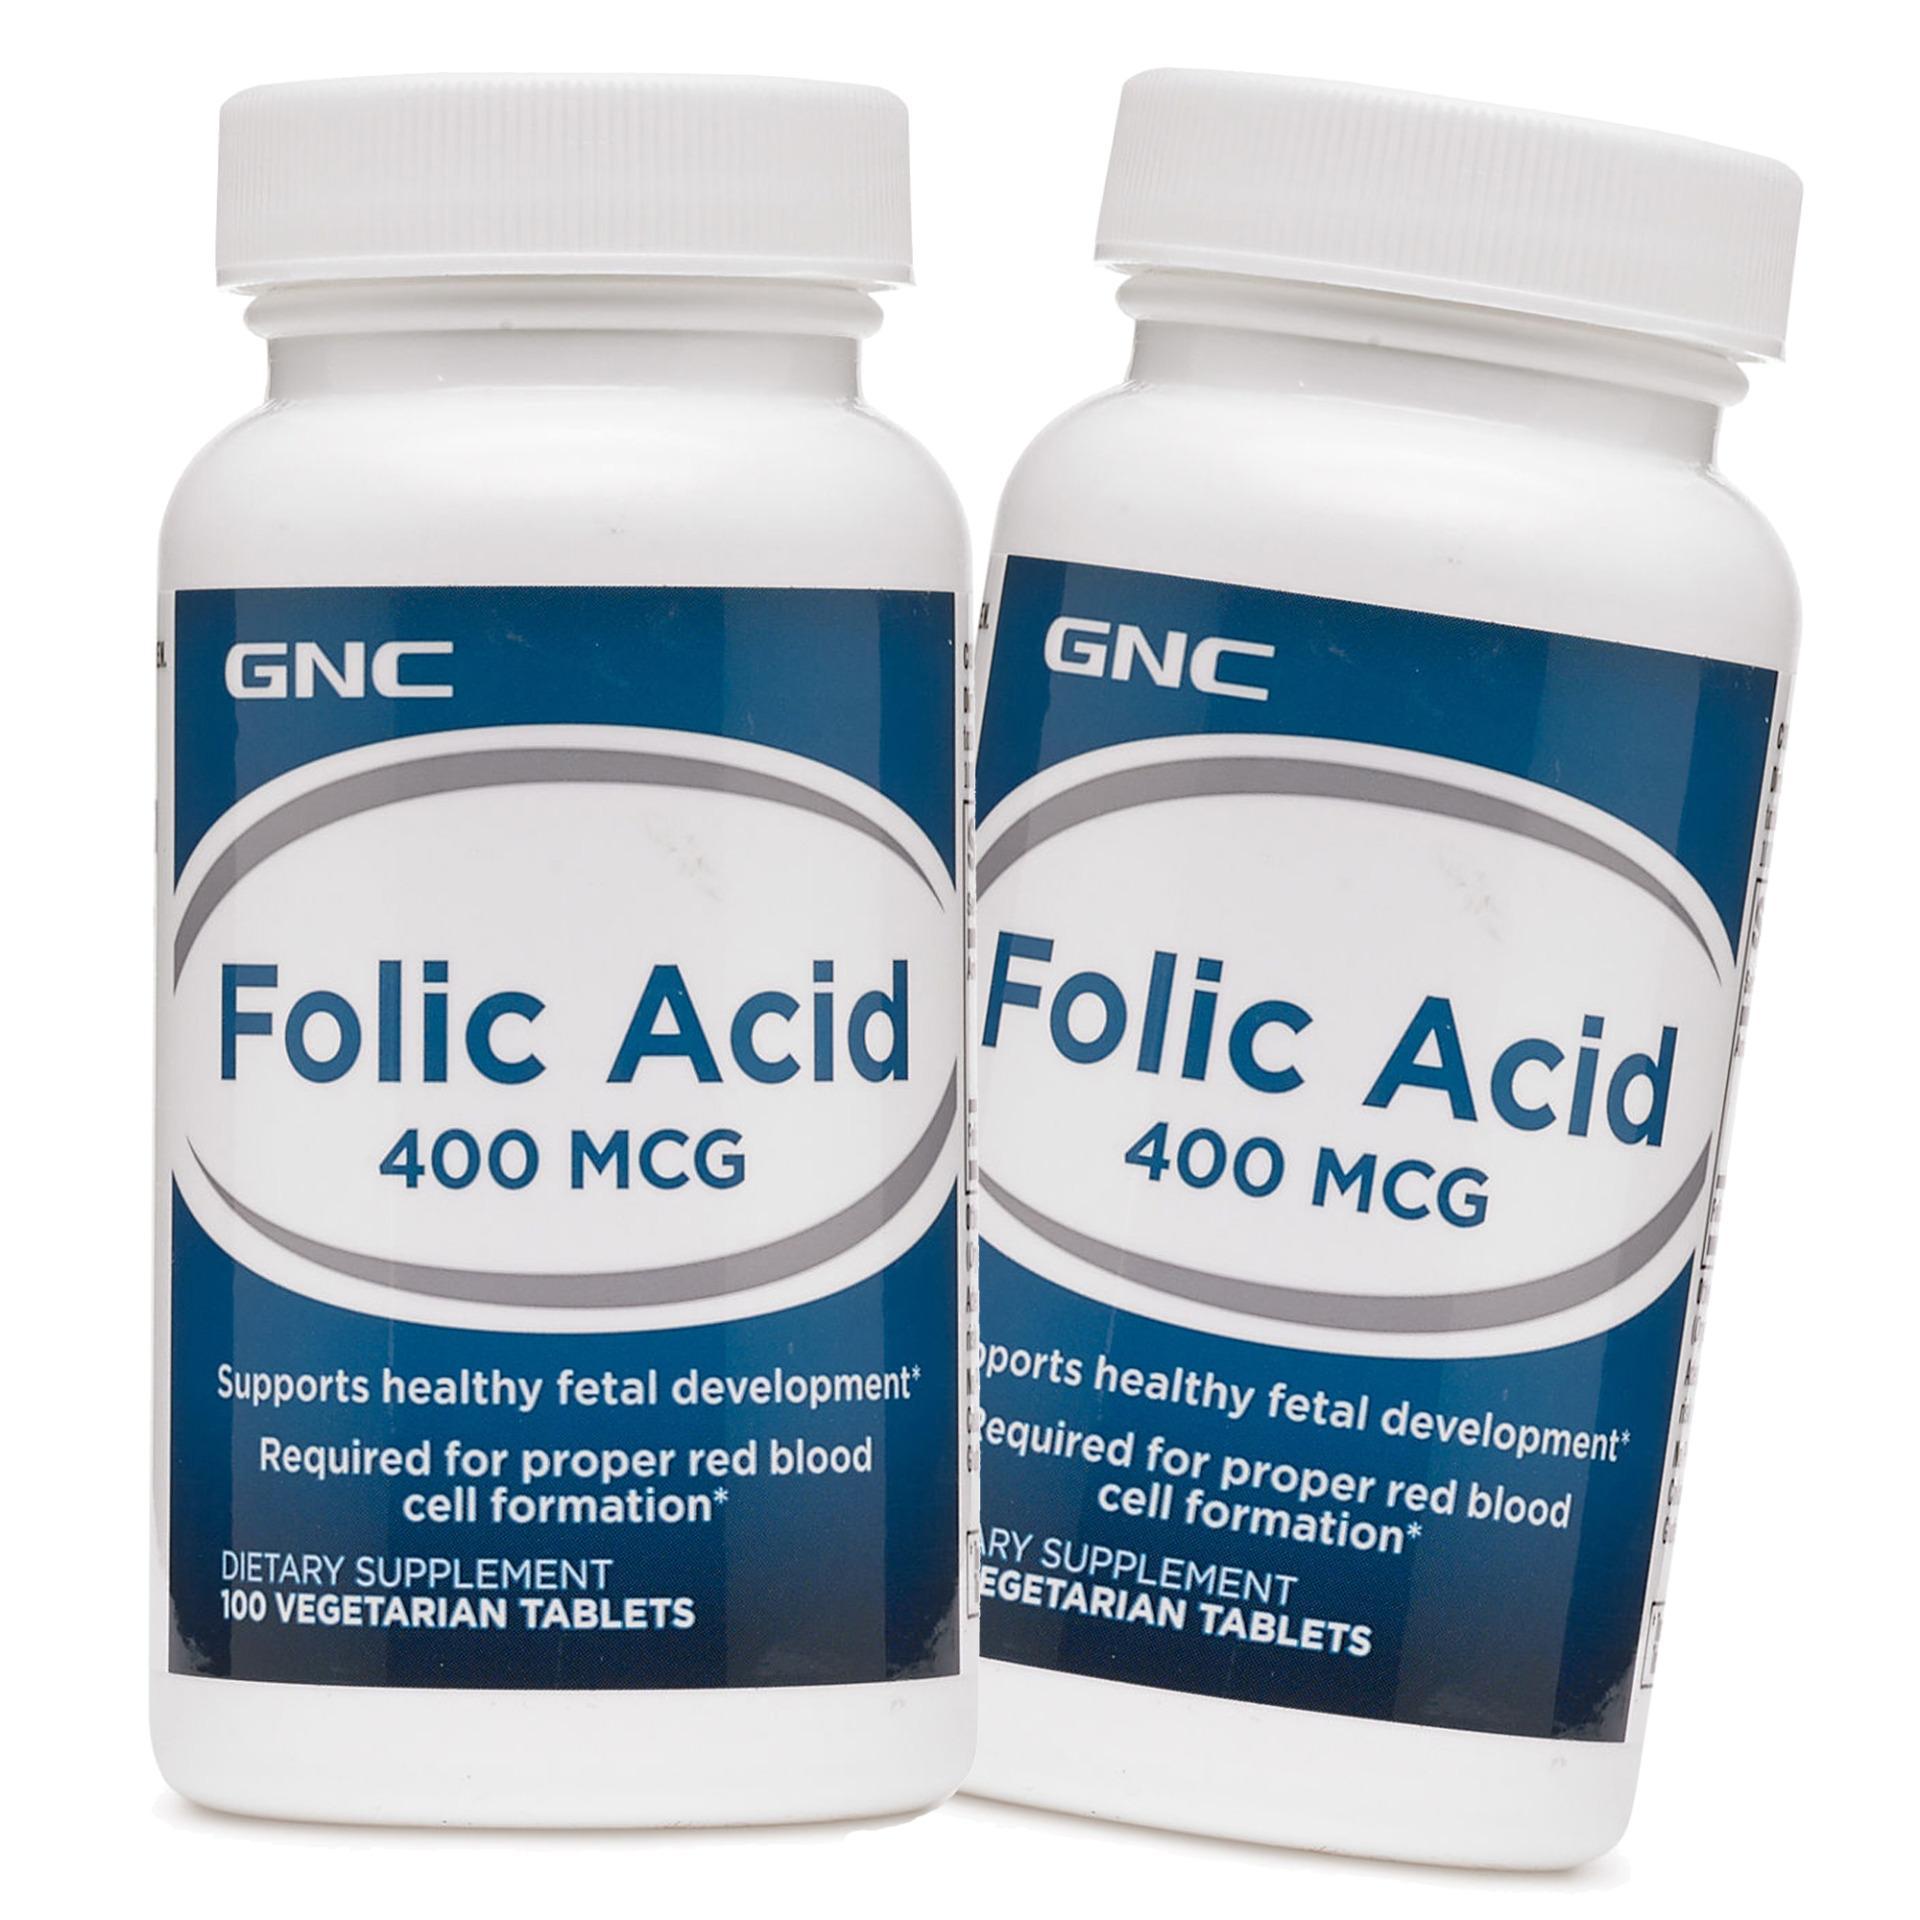 Gnc Folic Acid 400 Mcg 100 Tablets 2 Bottles Coupon Code